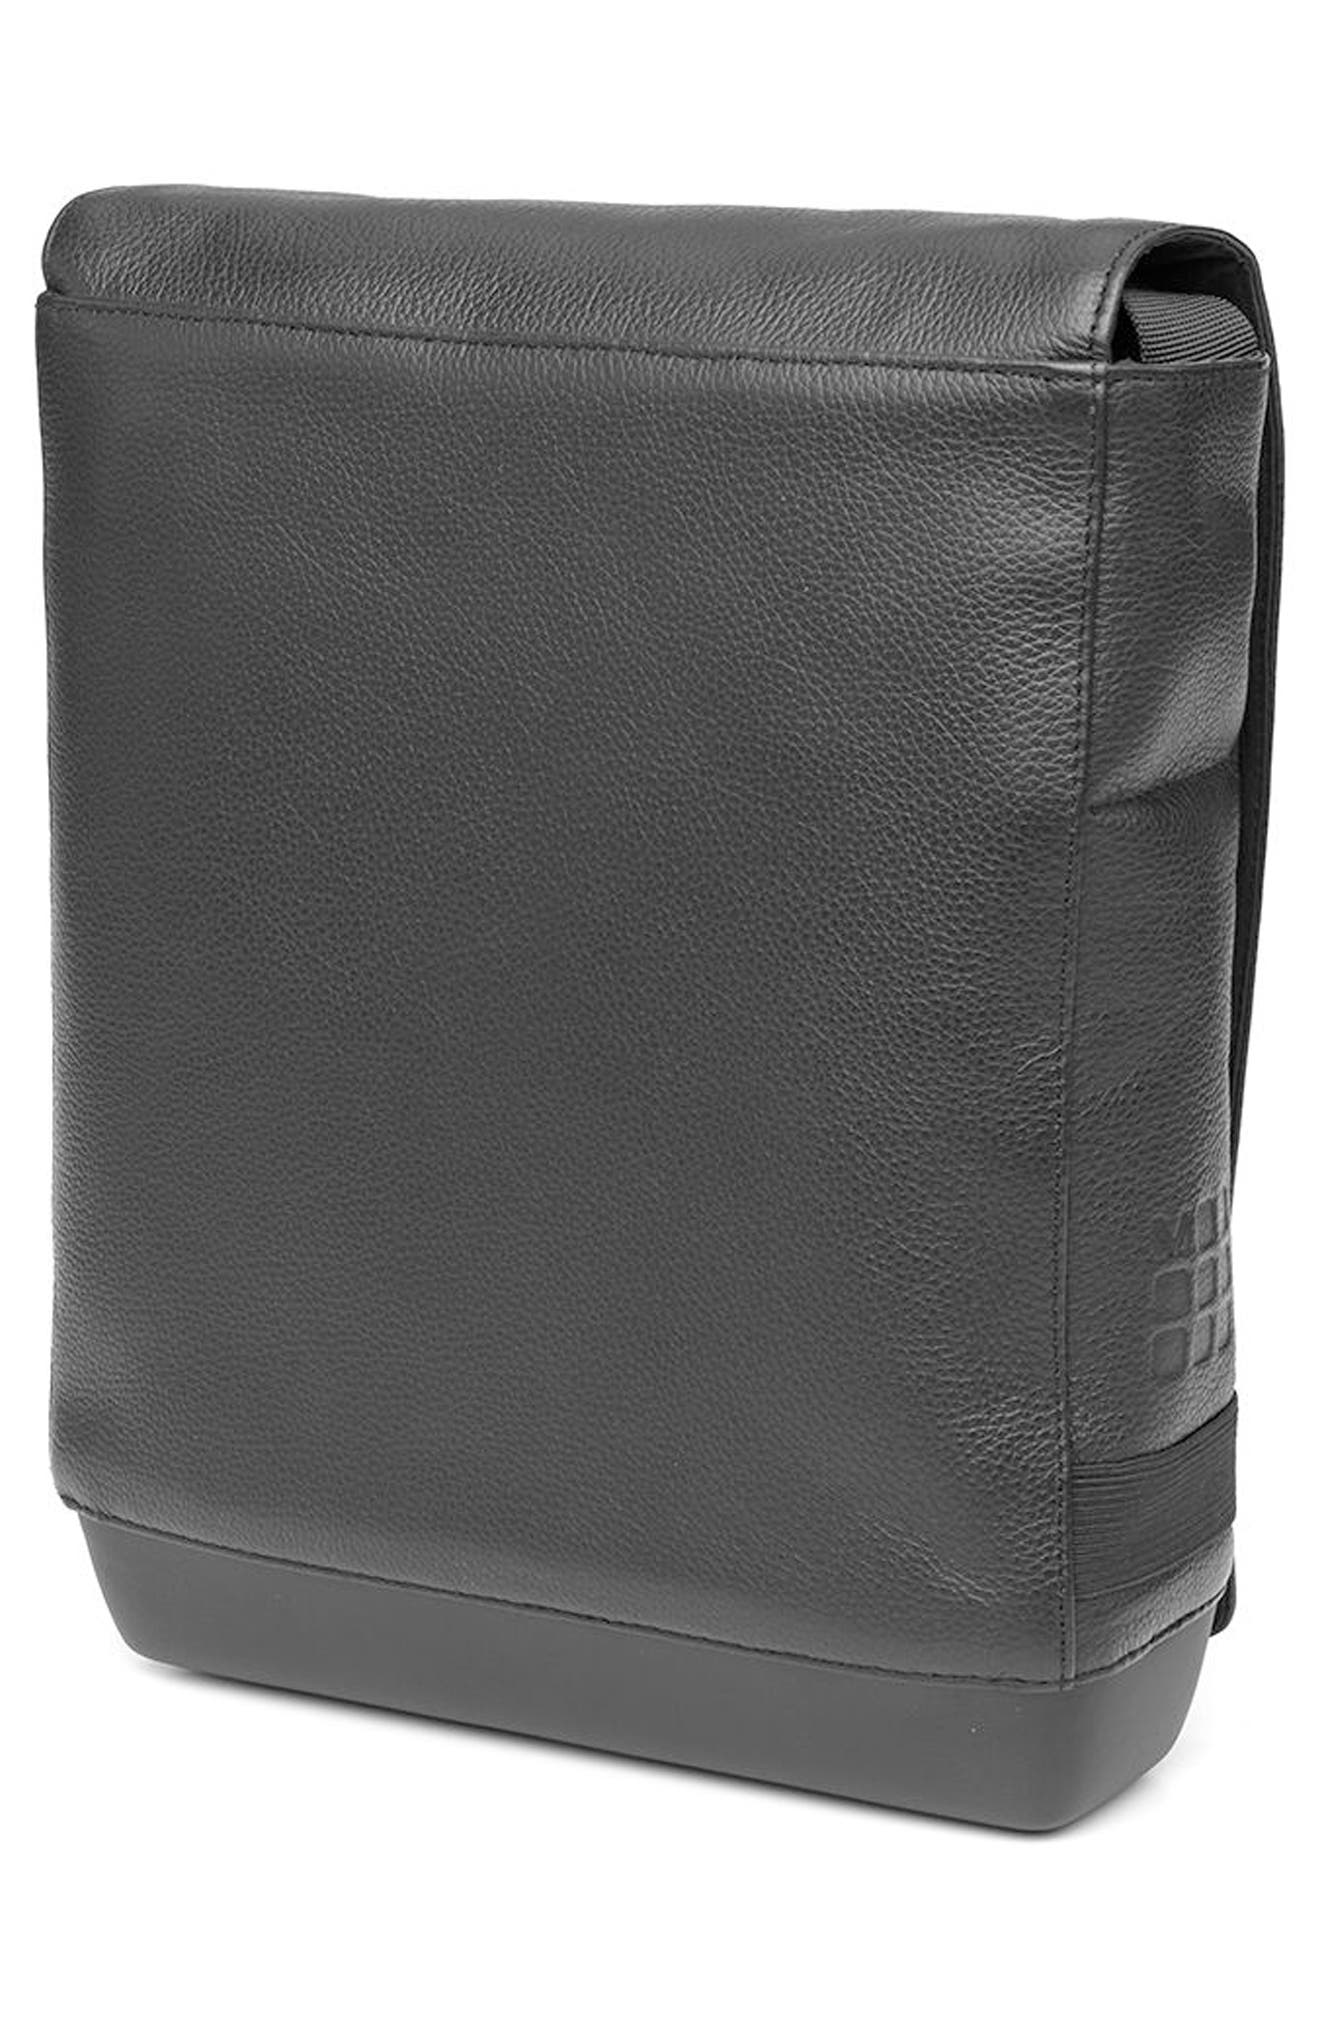 Leather Reporter Bag,                             Alternate thumbnail 2, color,                             001